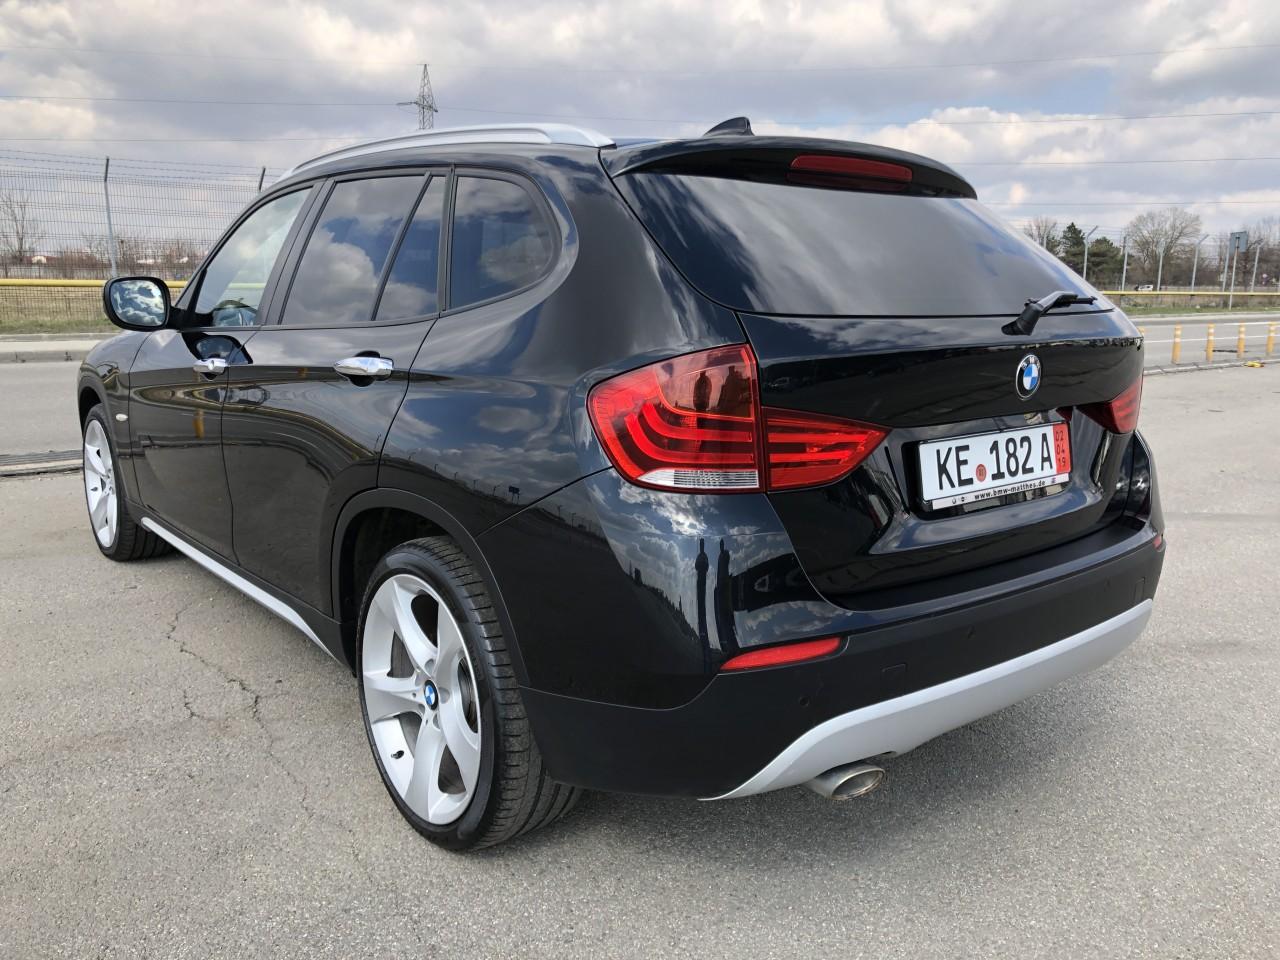 BMW X1 BMW X1 2.0d xDrive 177Cp XLine Automata / Navigatie / Bi-xenon / Piele / Pilot / PDC fata+spate / Bluetooth / etc..MASINA ARE RAR EFECTUAT,ITP 2021 si CARTE DE ROMANIA!!! 2010